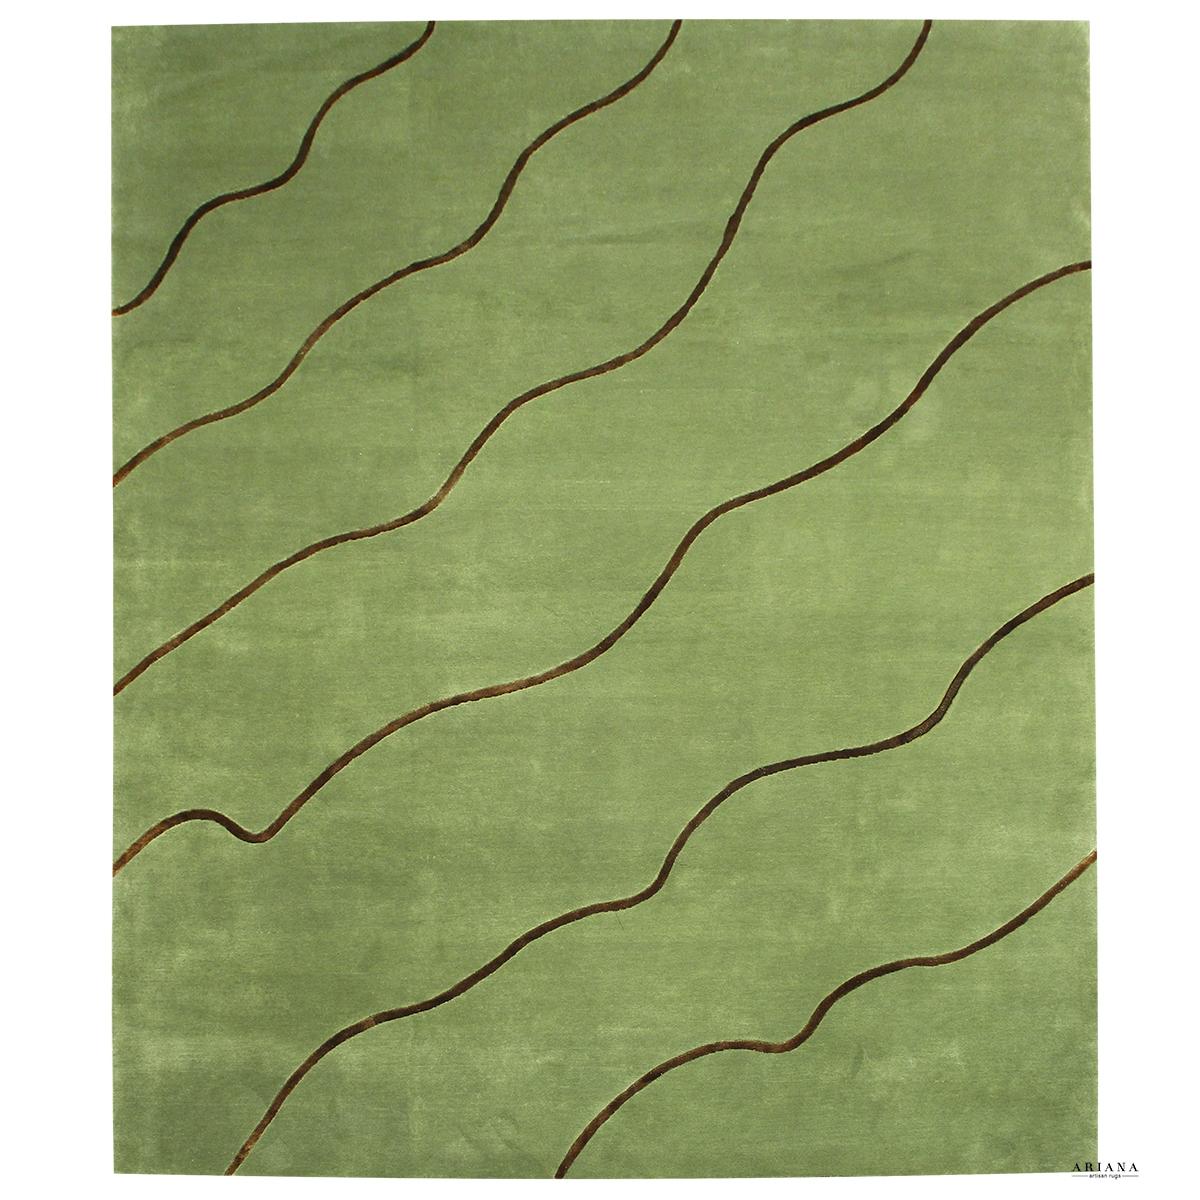 Indo Nepali Wool B Silk Ariana Rug Co